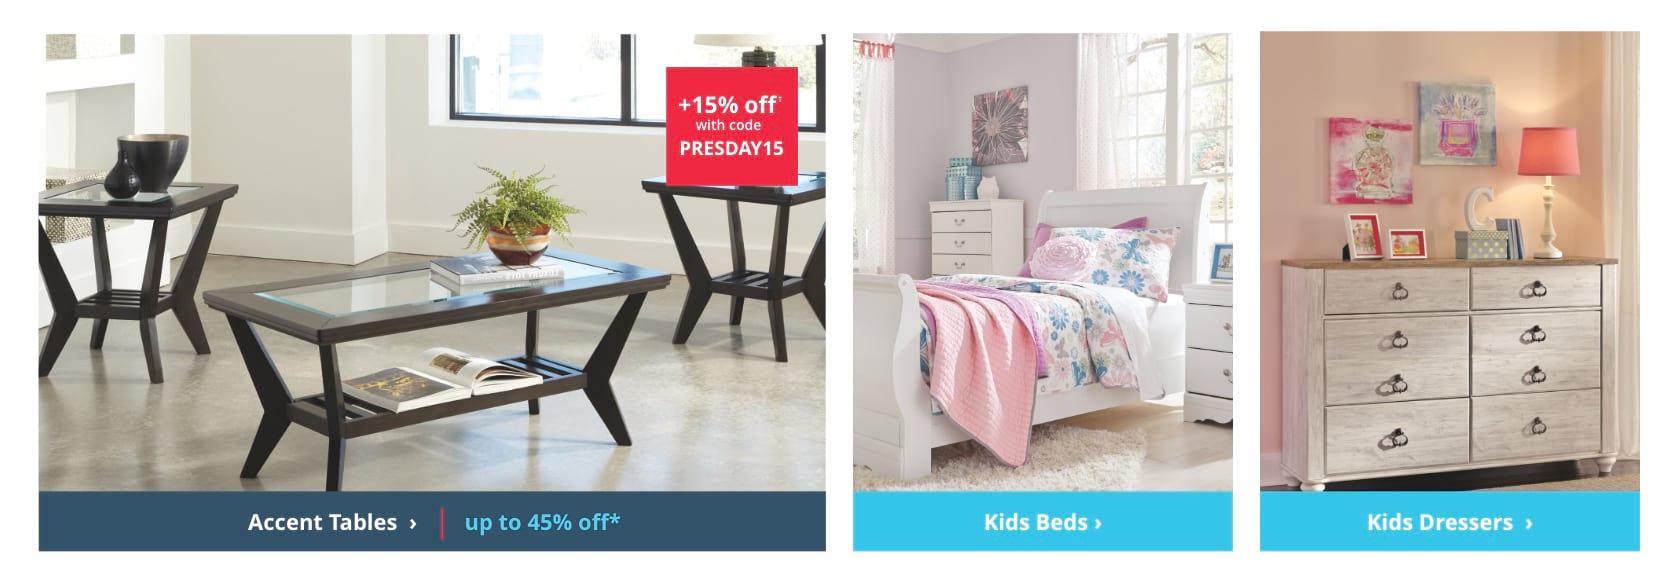 Shop TV Stands, Kids Beds, Kids Dressers